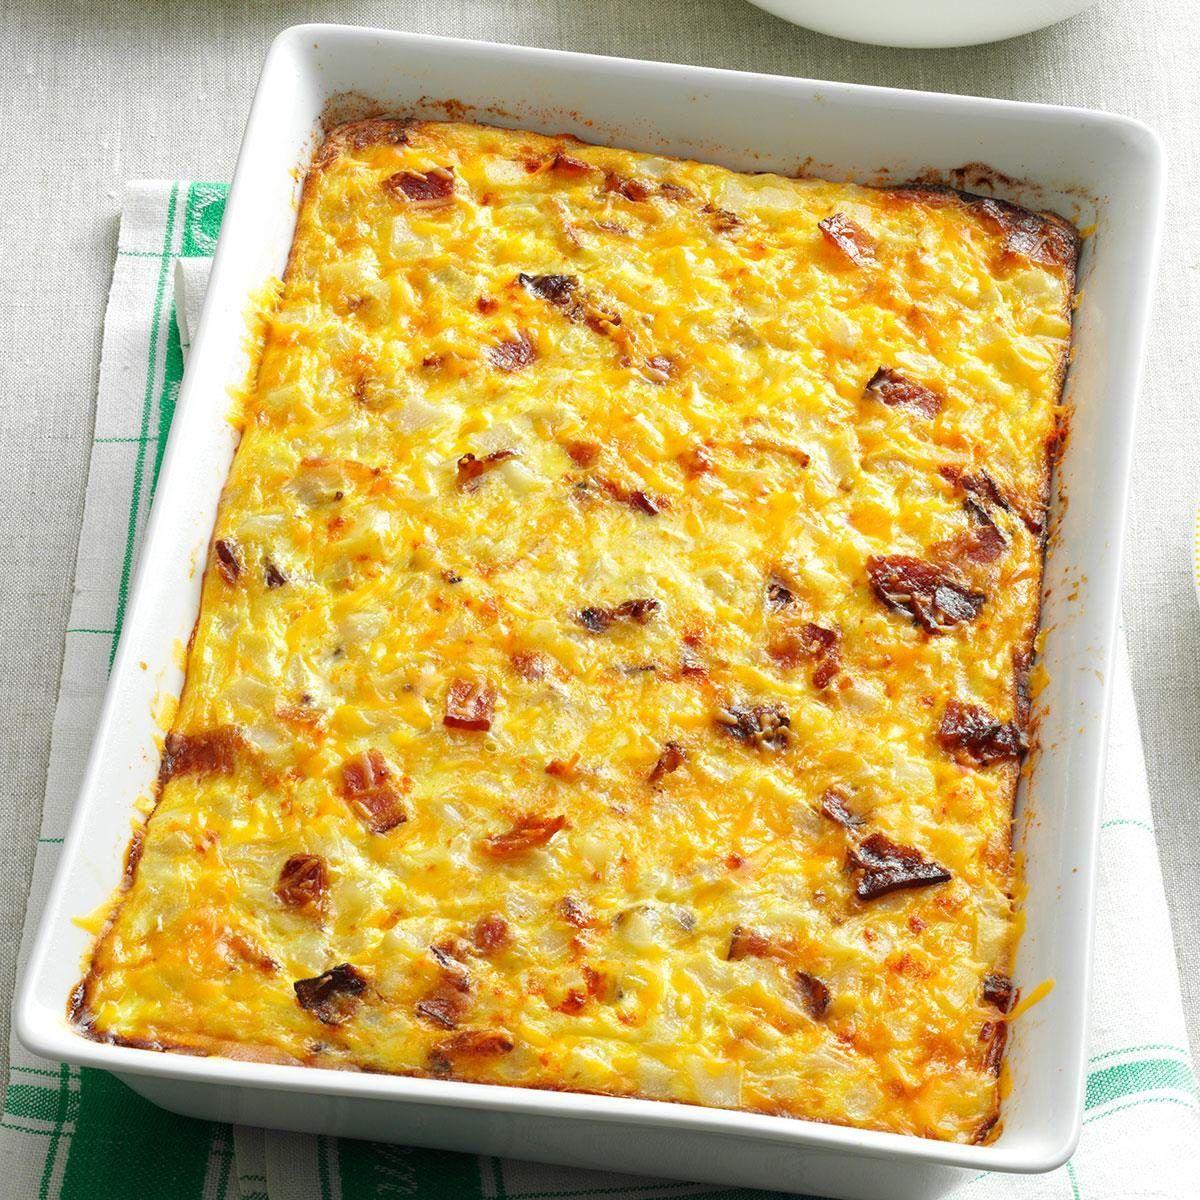 Brunch Egg Bake Recipe In 2020 Brunch Egg Bake Recipes Brunch Dishes